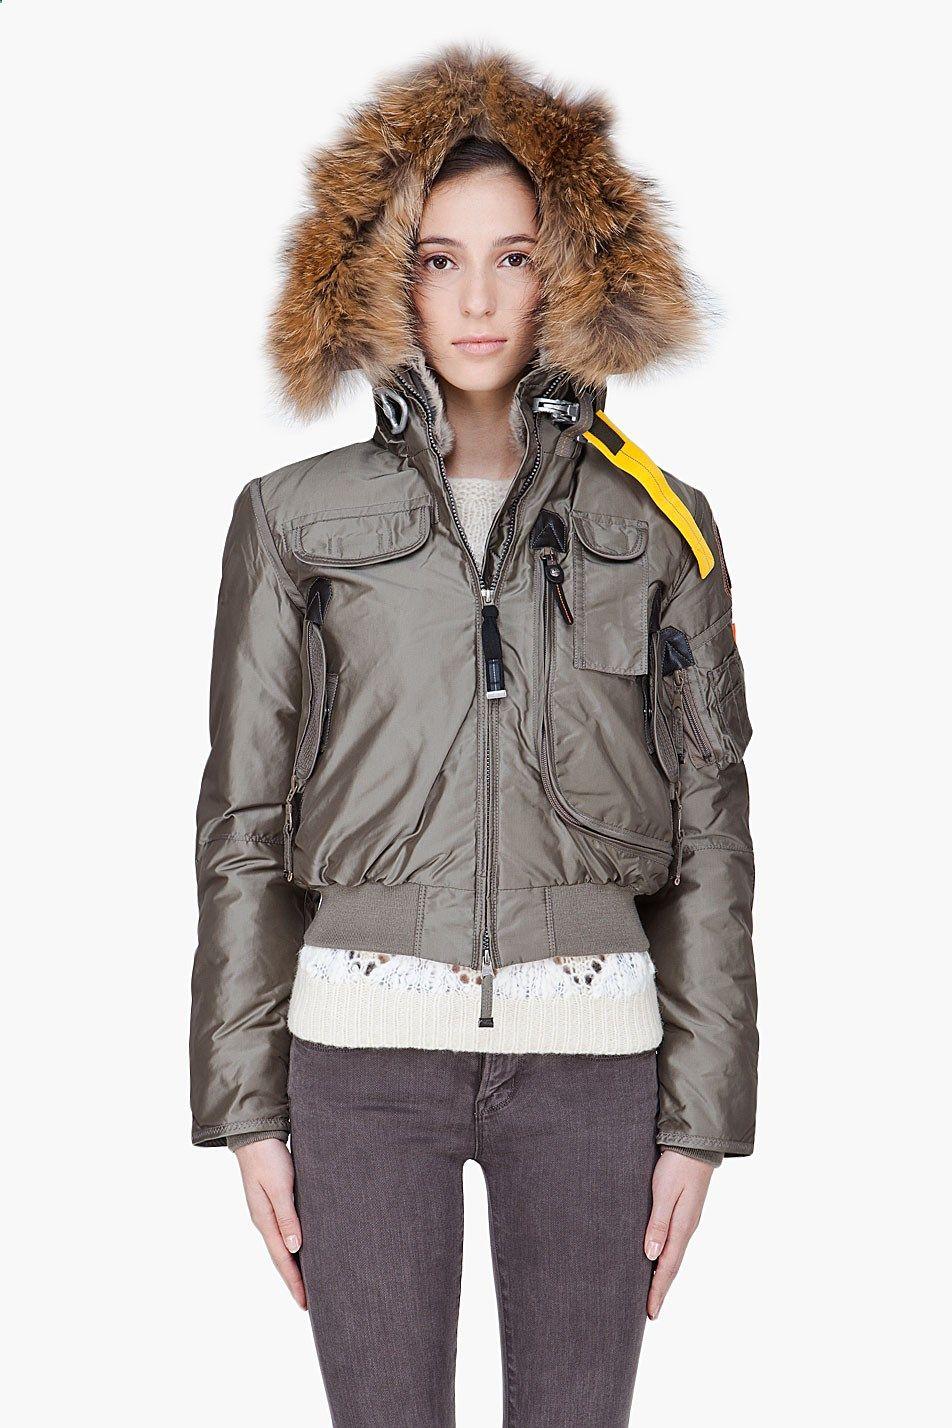 parajumpers women's gobi jacket